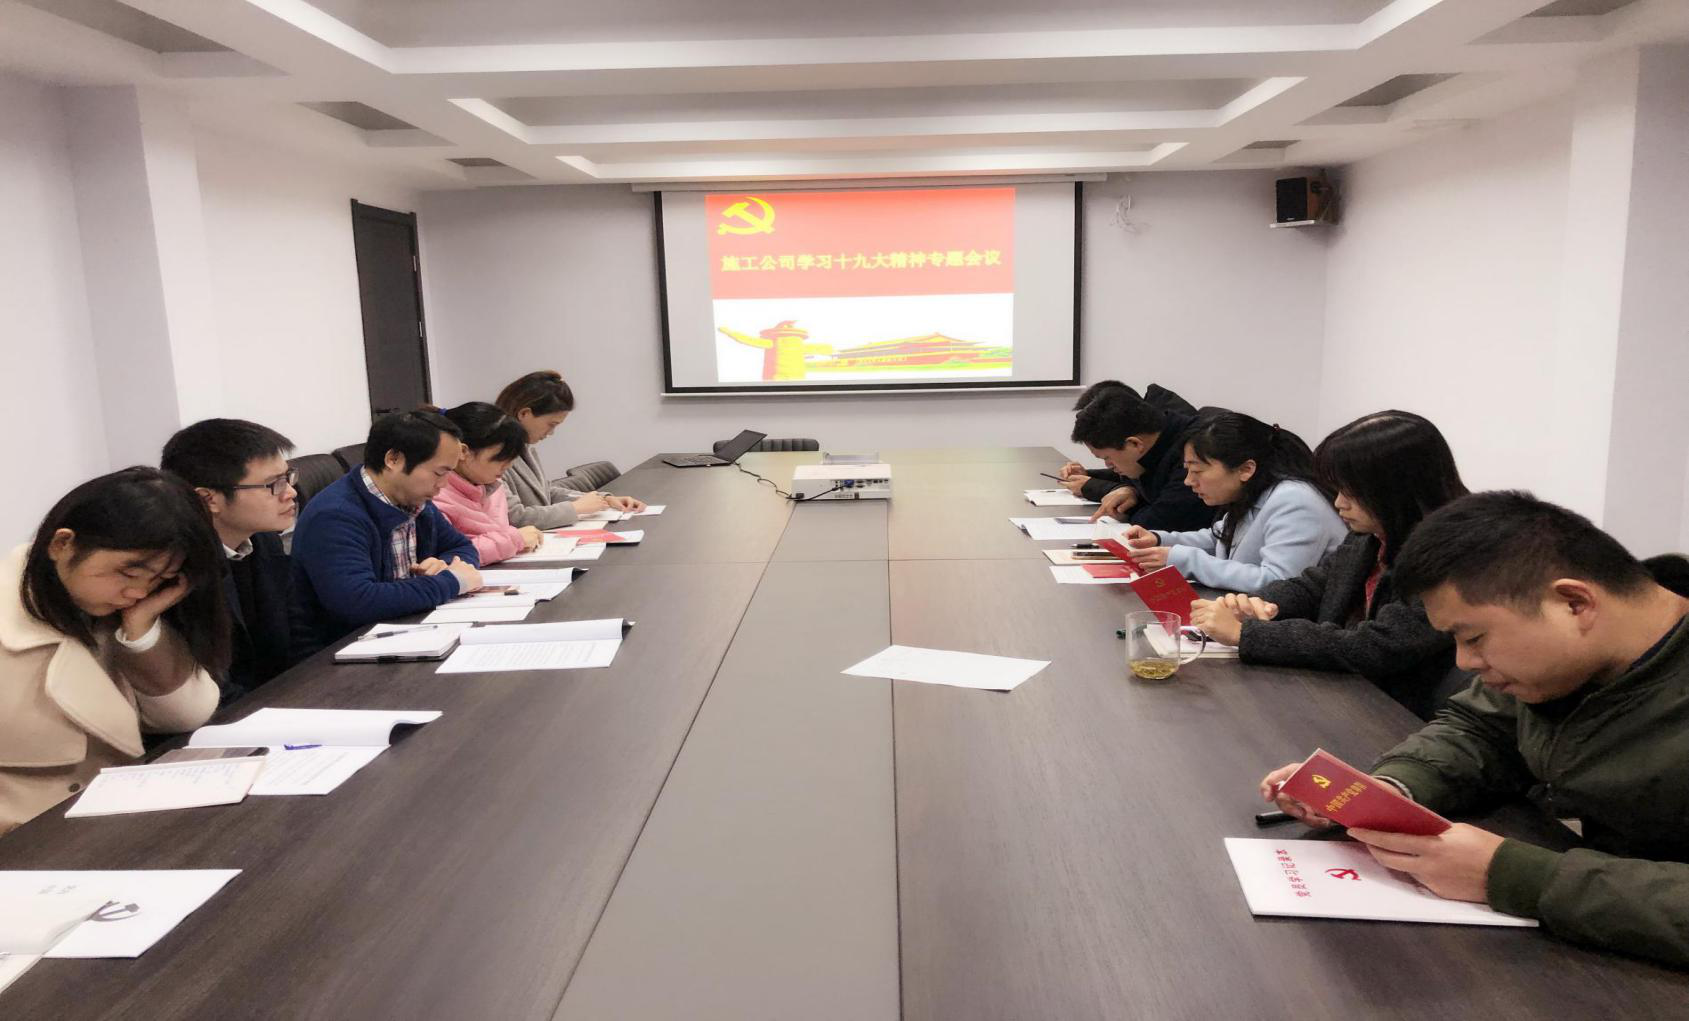 yabox4公司党支部专题学习十九大会议精神